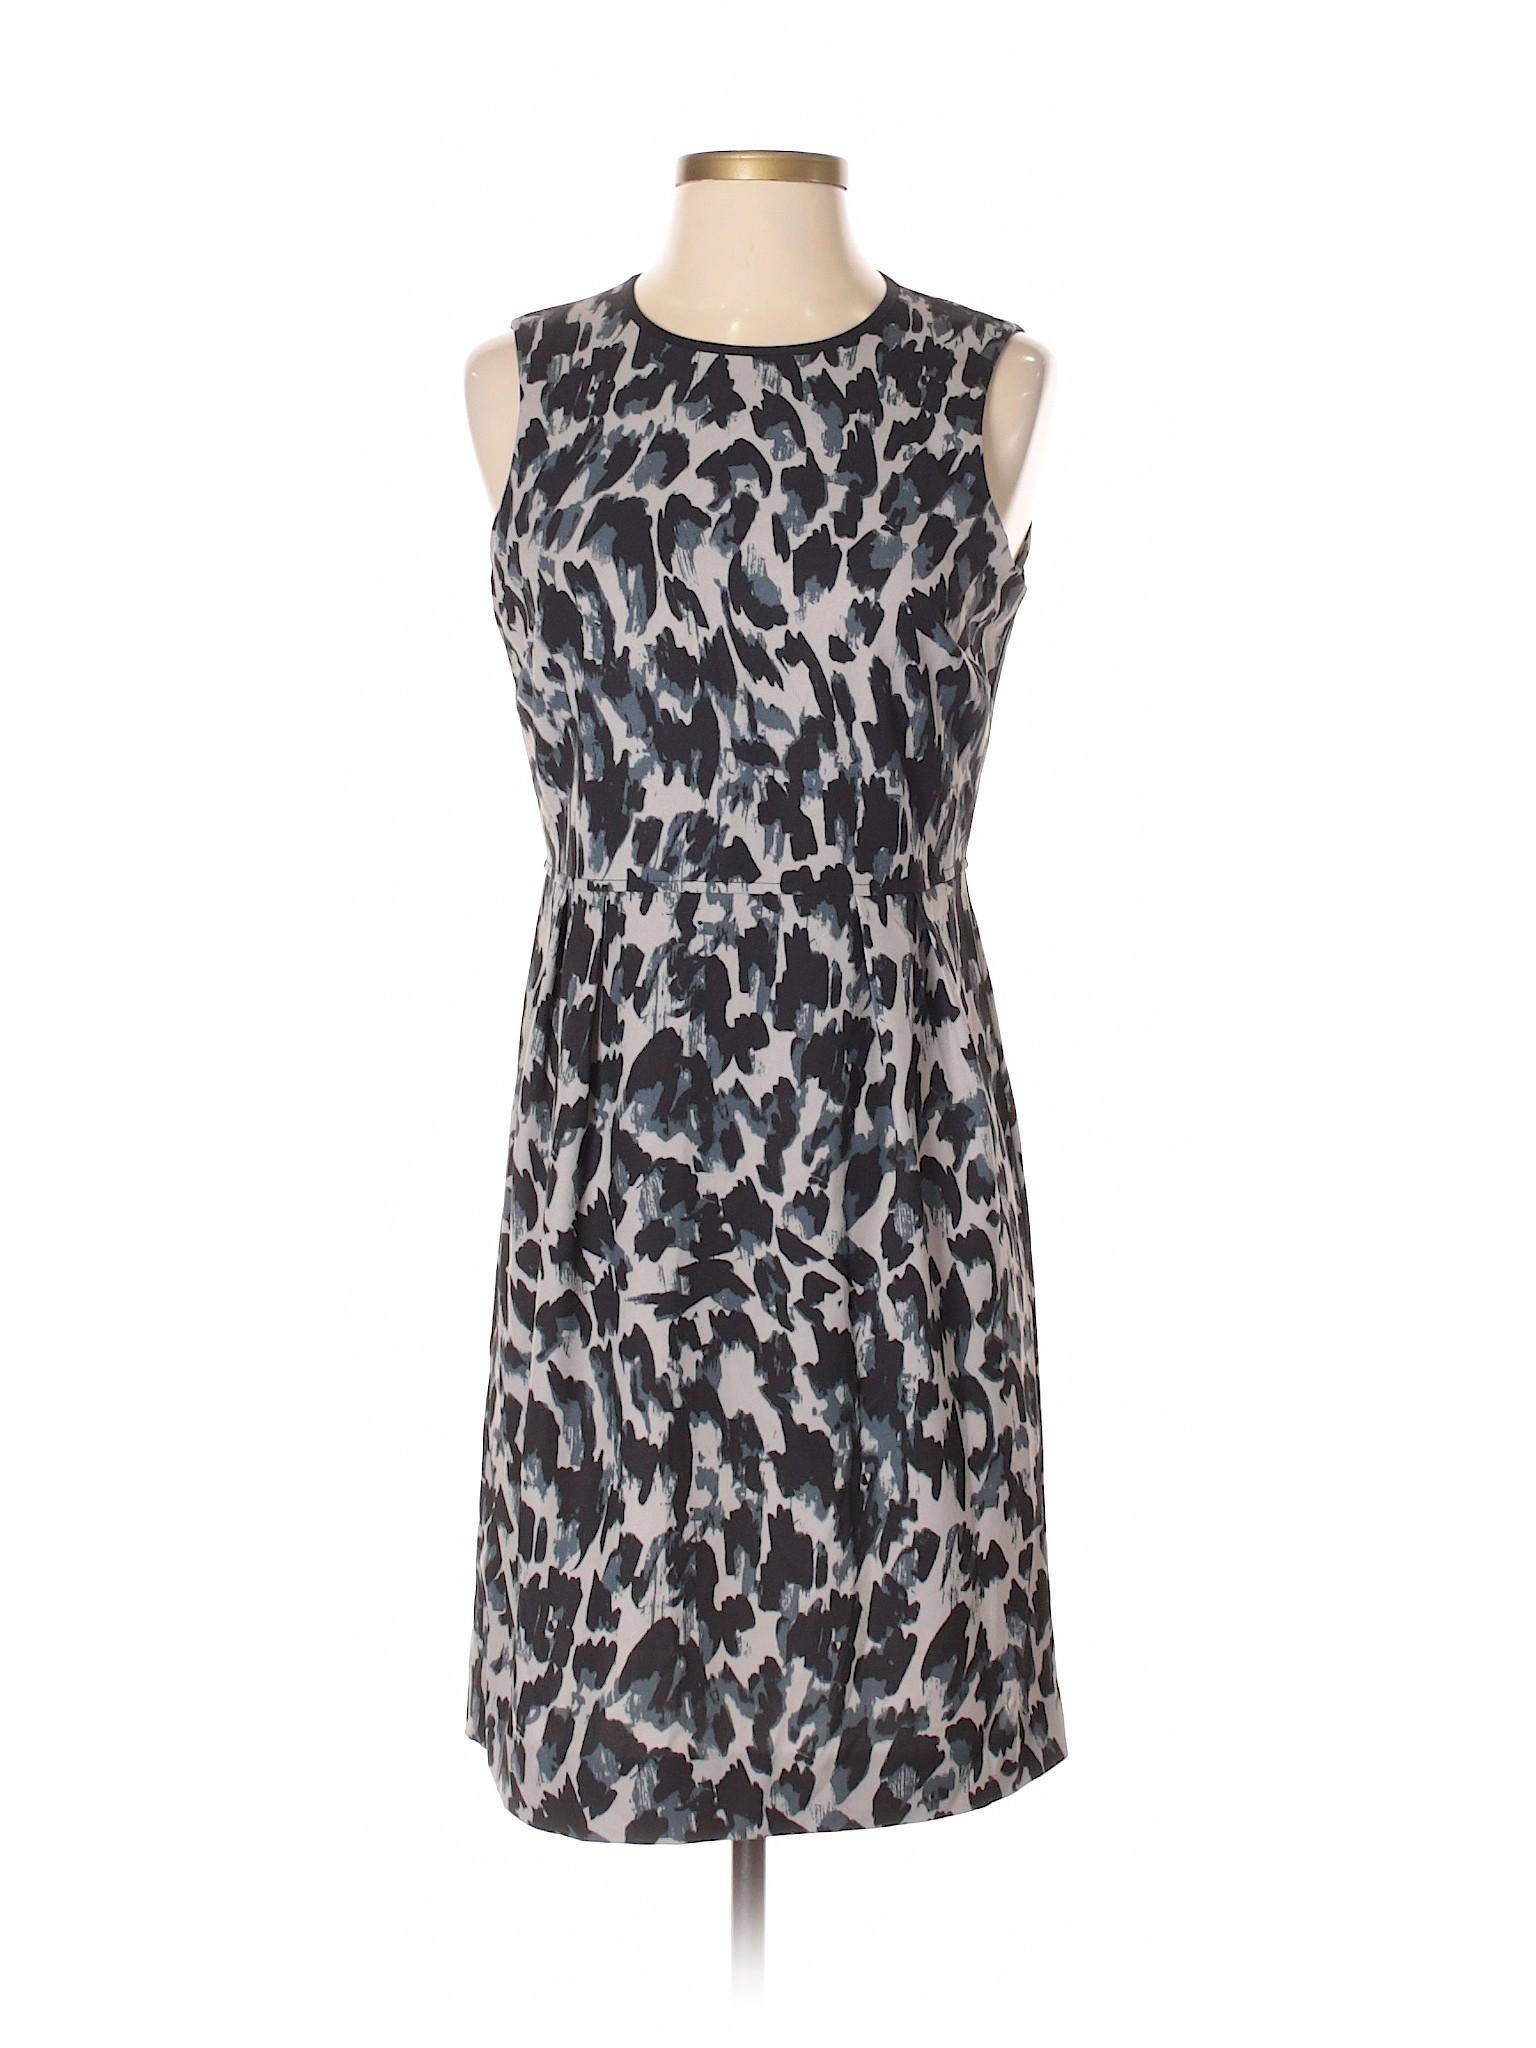 winter Boutique Casual LOFT Dress Ann Taylor z1a6wUq